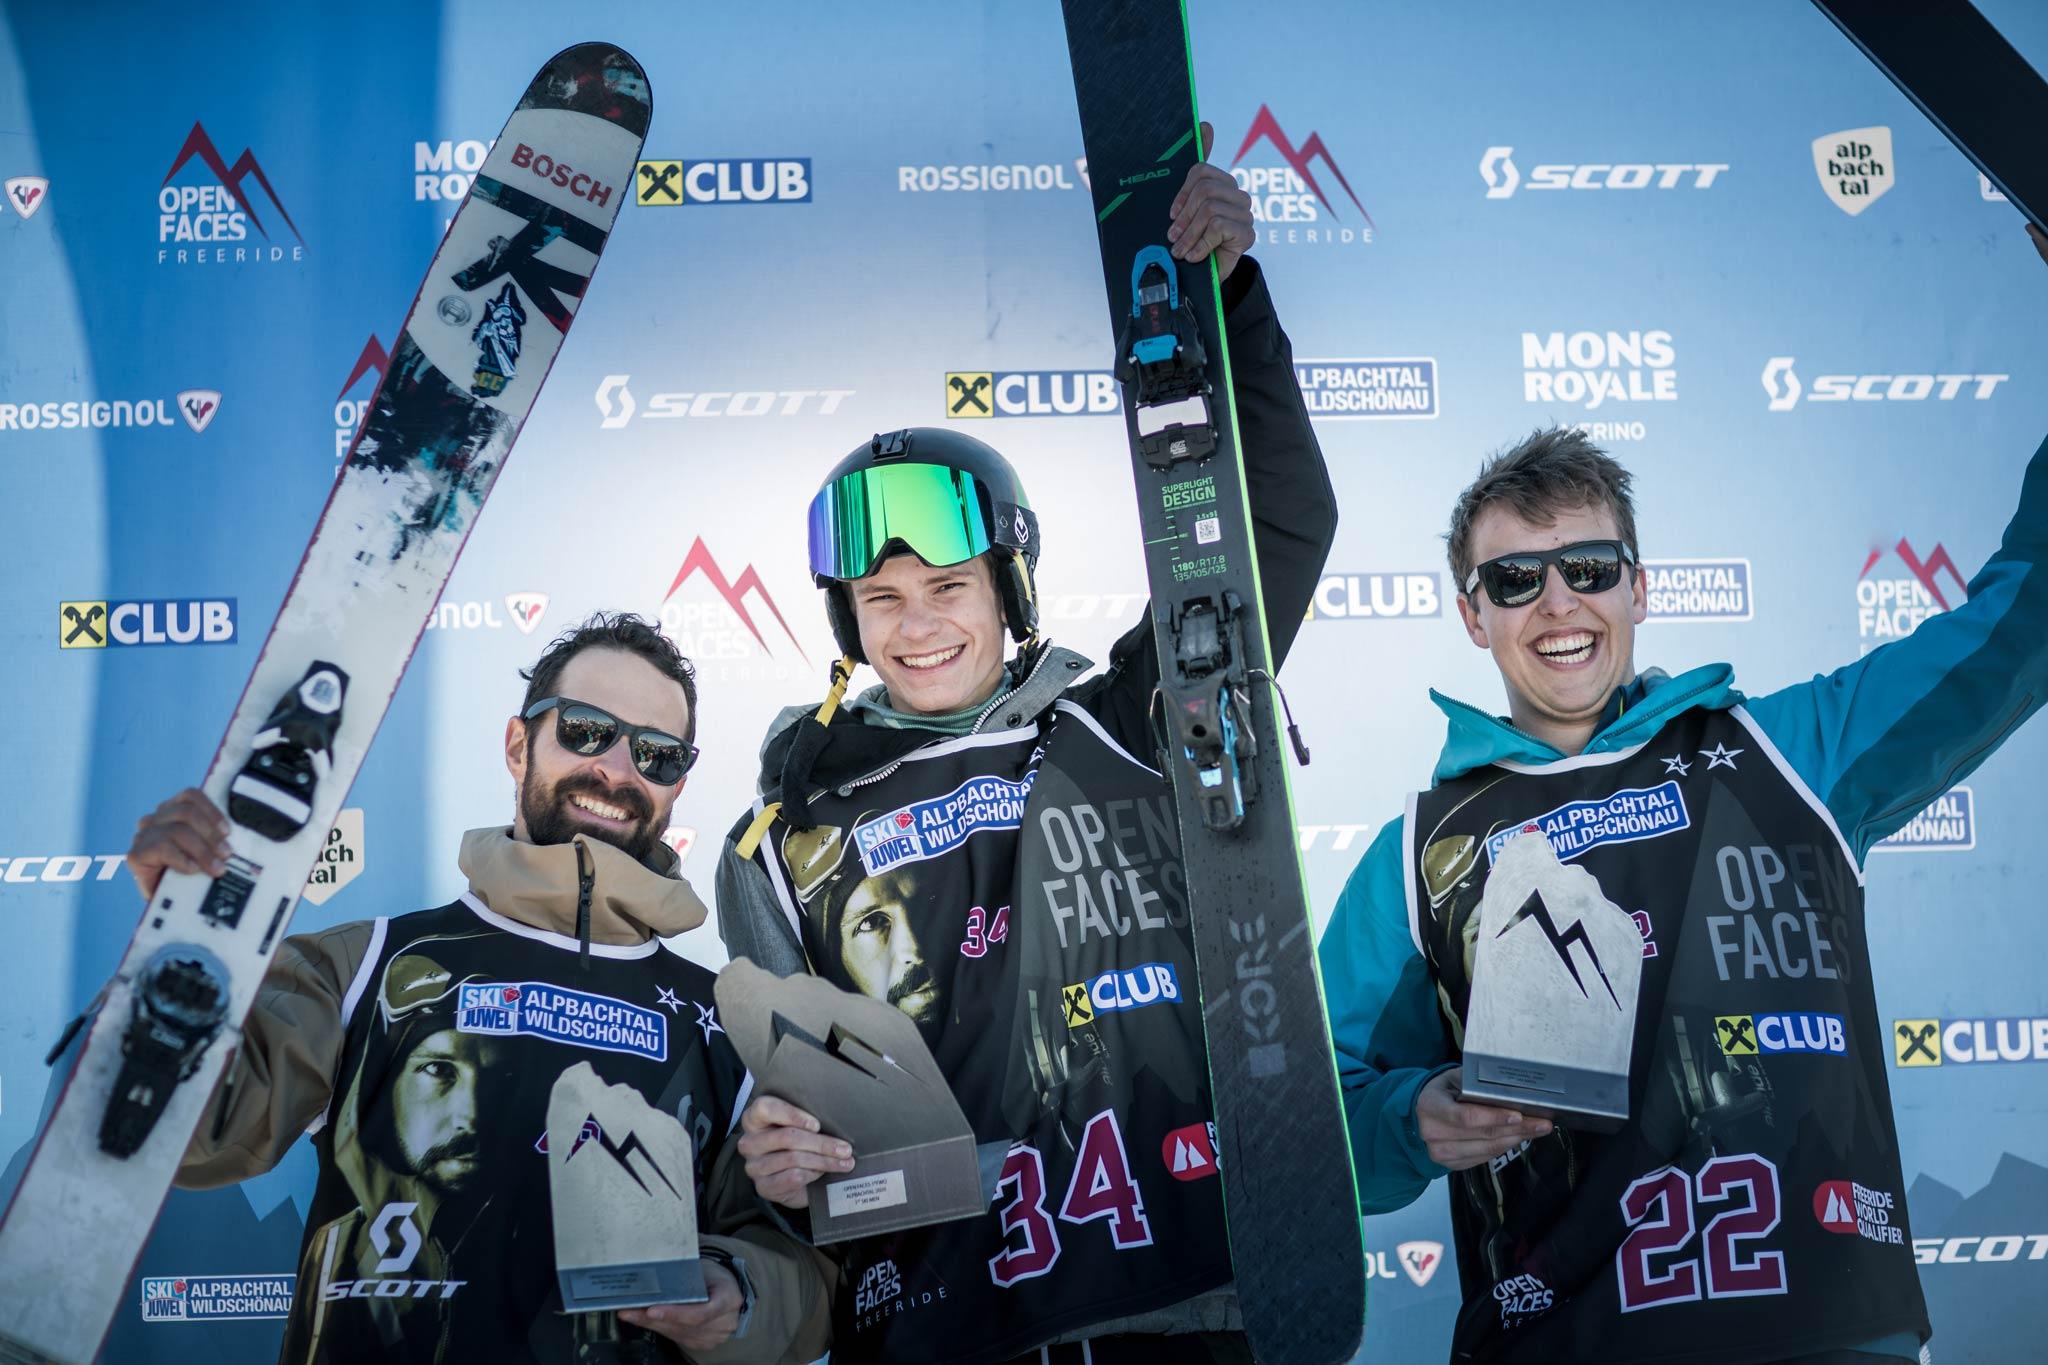 Die drei besten Männer im Alpbachtal: Kilian Gross (AUT), Niko Partell (AUT), Boyan Baacharov (BGR) - Foto: Mia Knoll